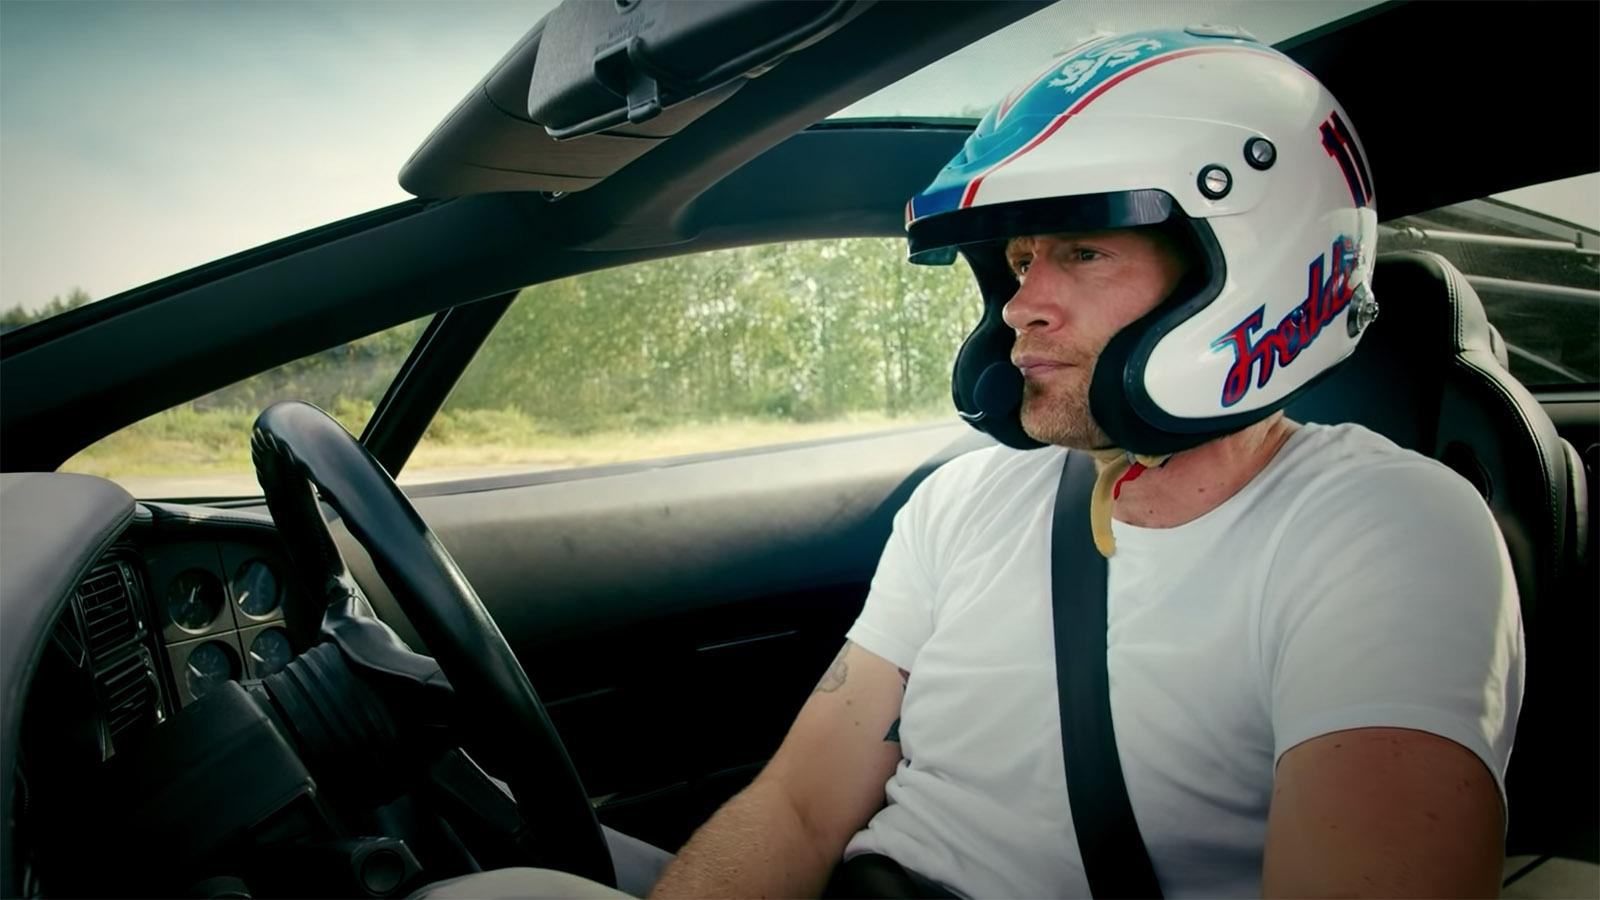 Freddie Flintoff Top Gear presenter